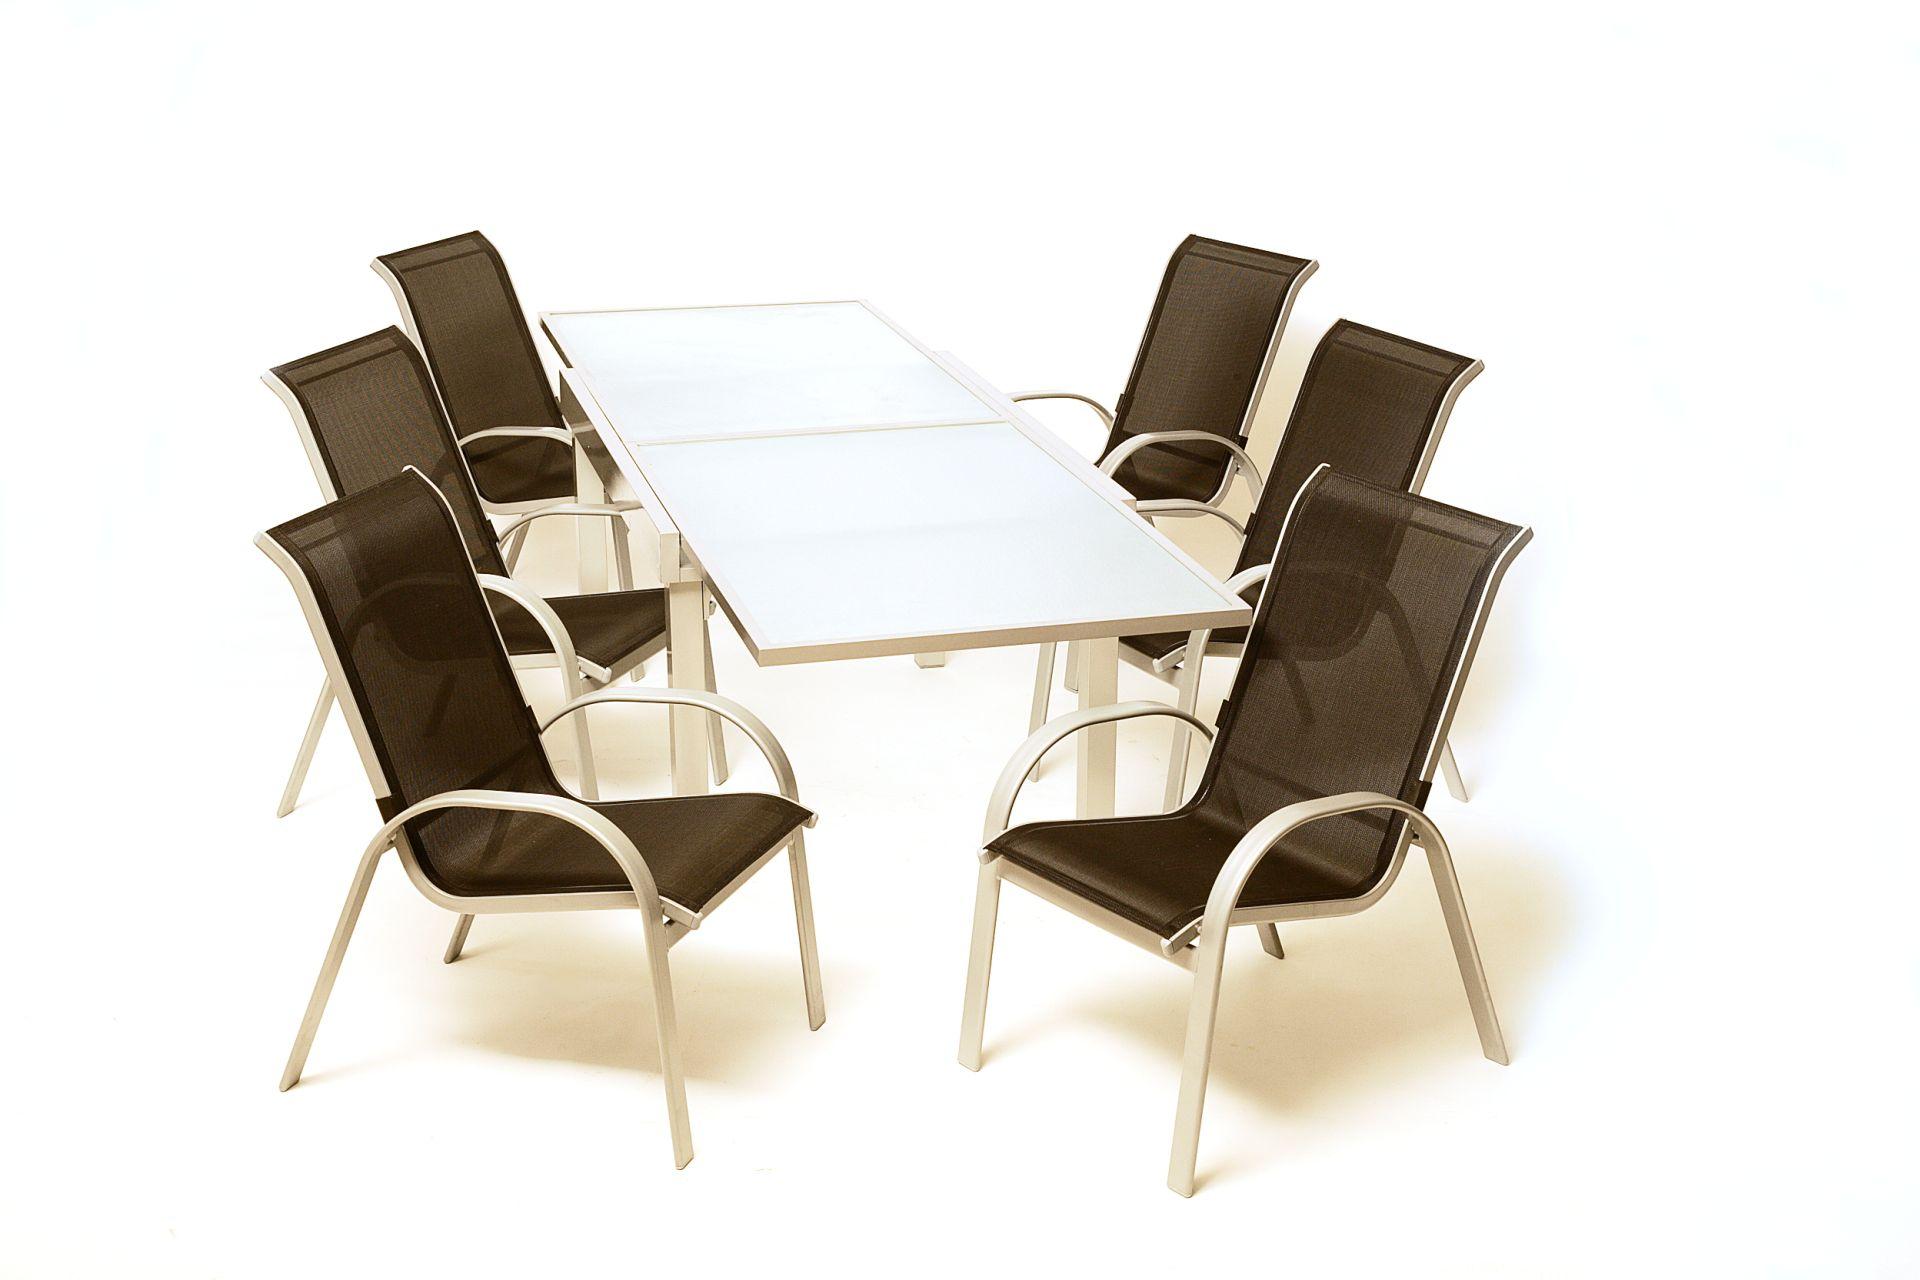 2x stapelsessel alusessel amalfi aluminium silber kunststoffgewebe schwarz ebay. Black Bedroom Furniture Sets. Home Design Ideas